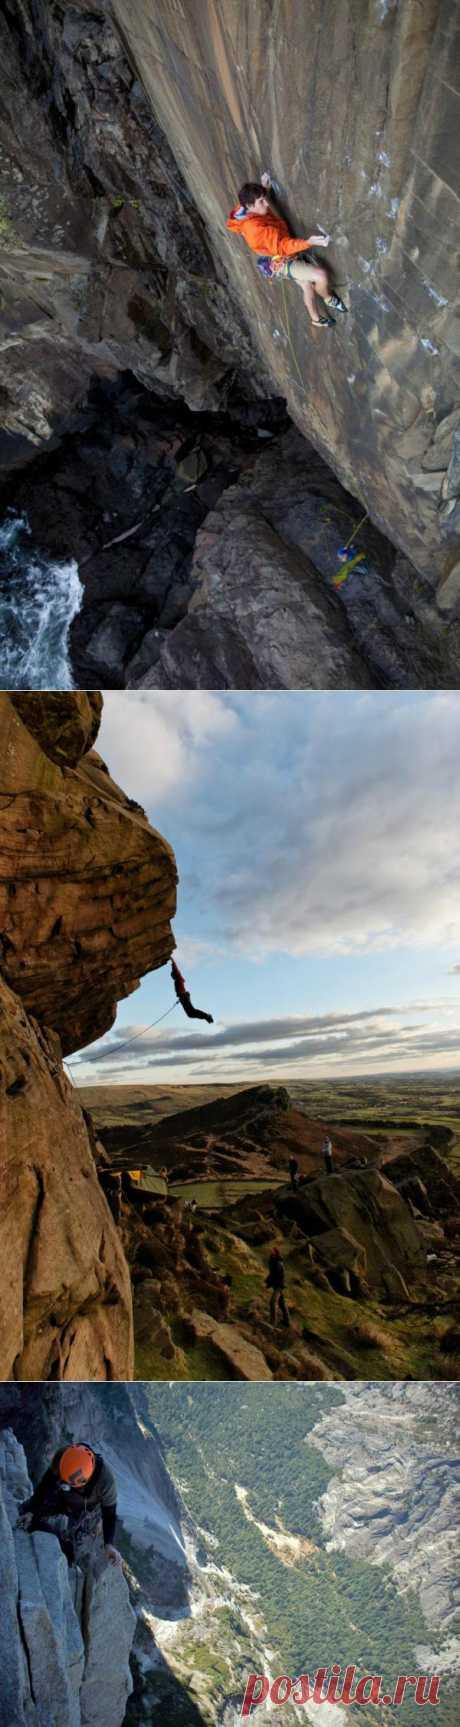 Dizzy photos of rock-climbers